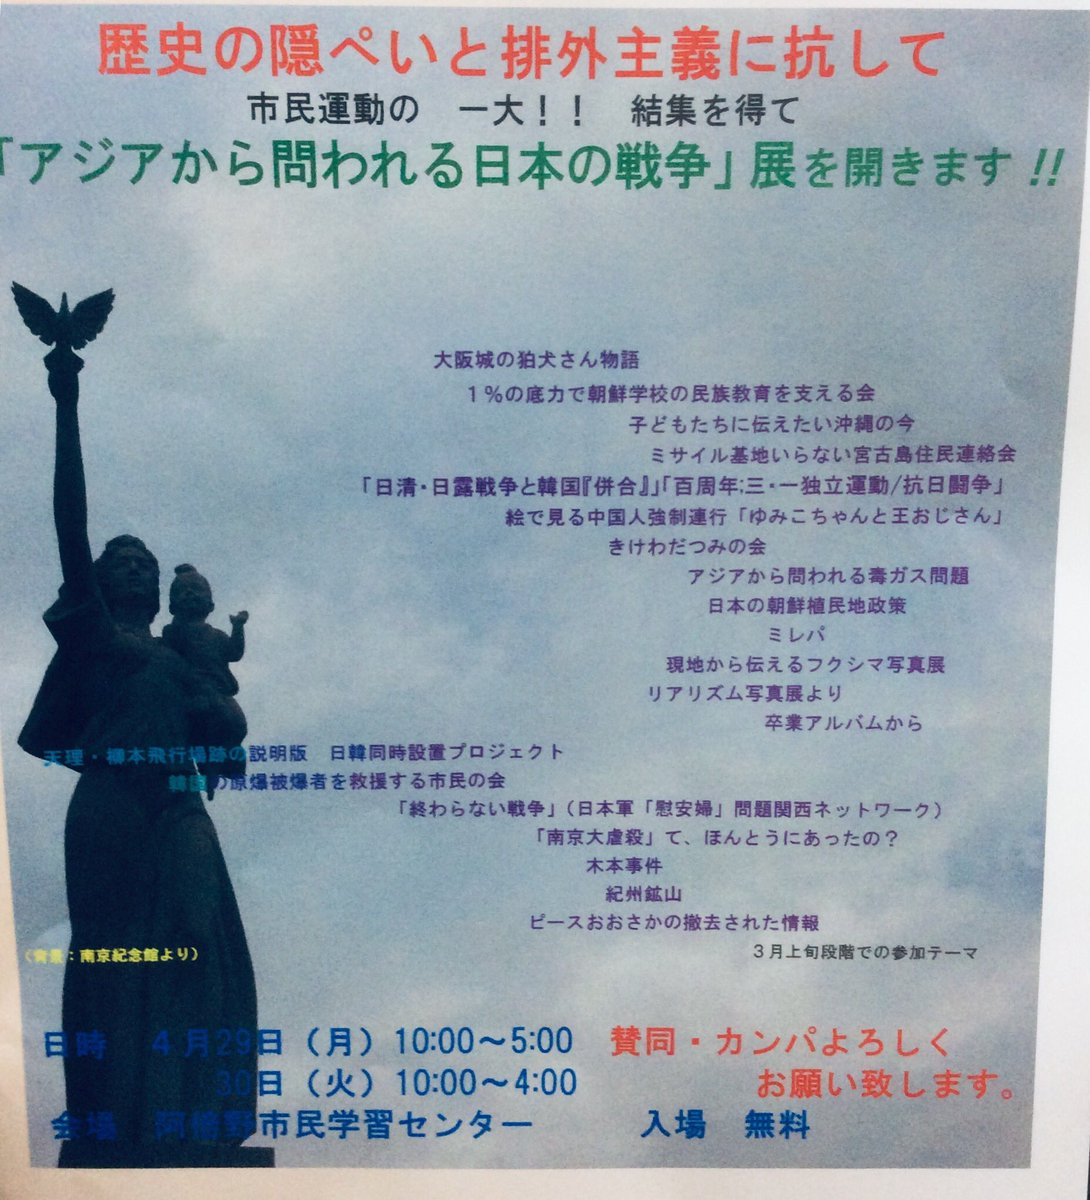 "urokosmile on Twitter: ""29日 12:30から 「日清・日露戦争と韓国 ..."